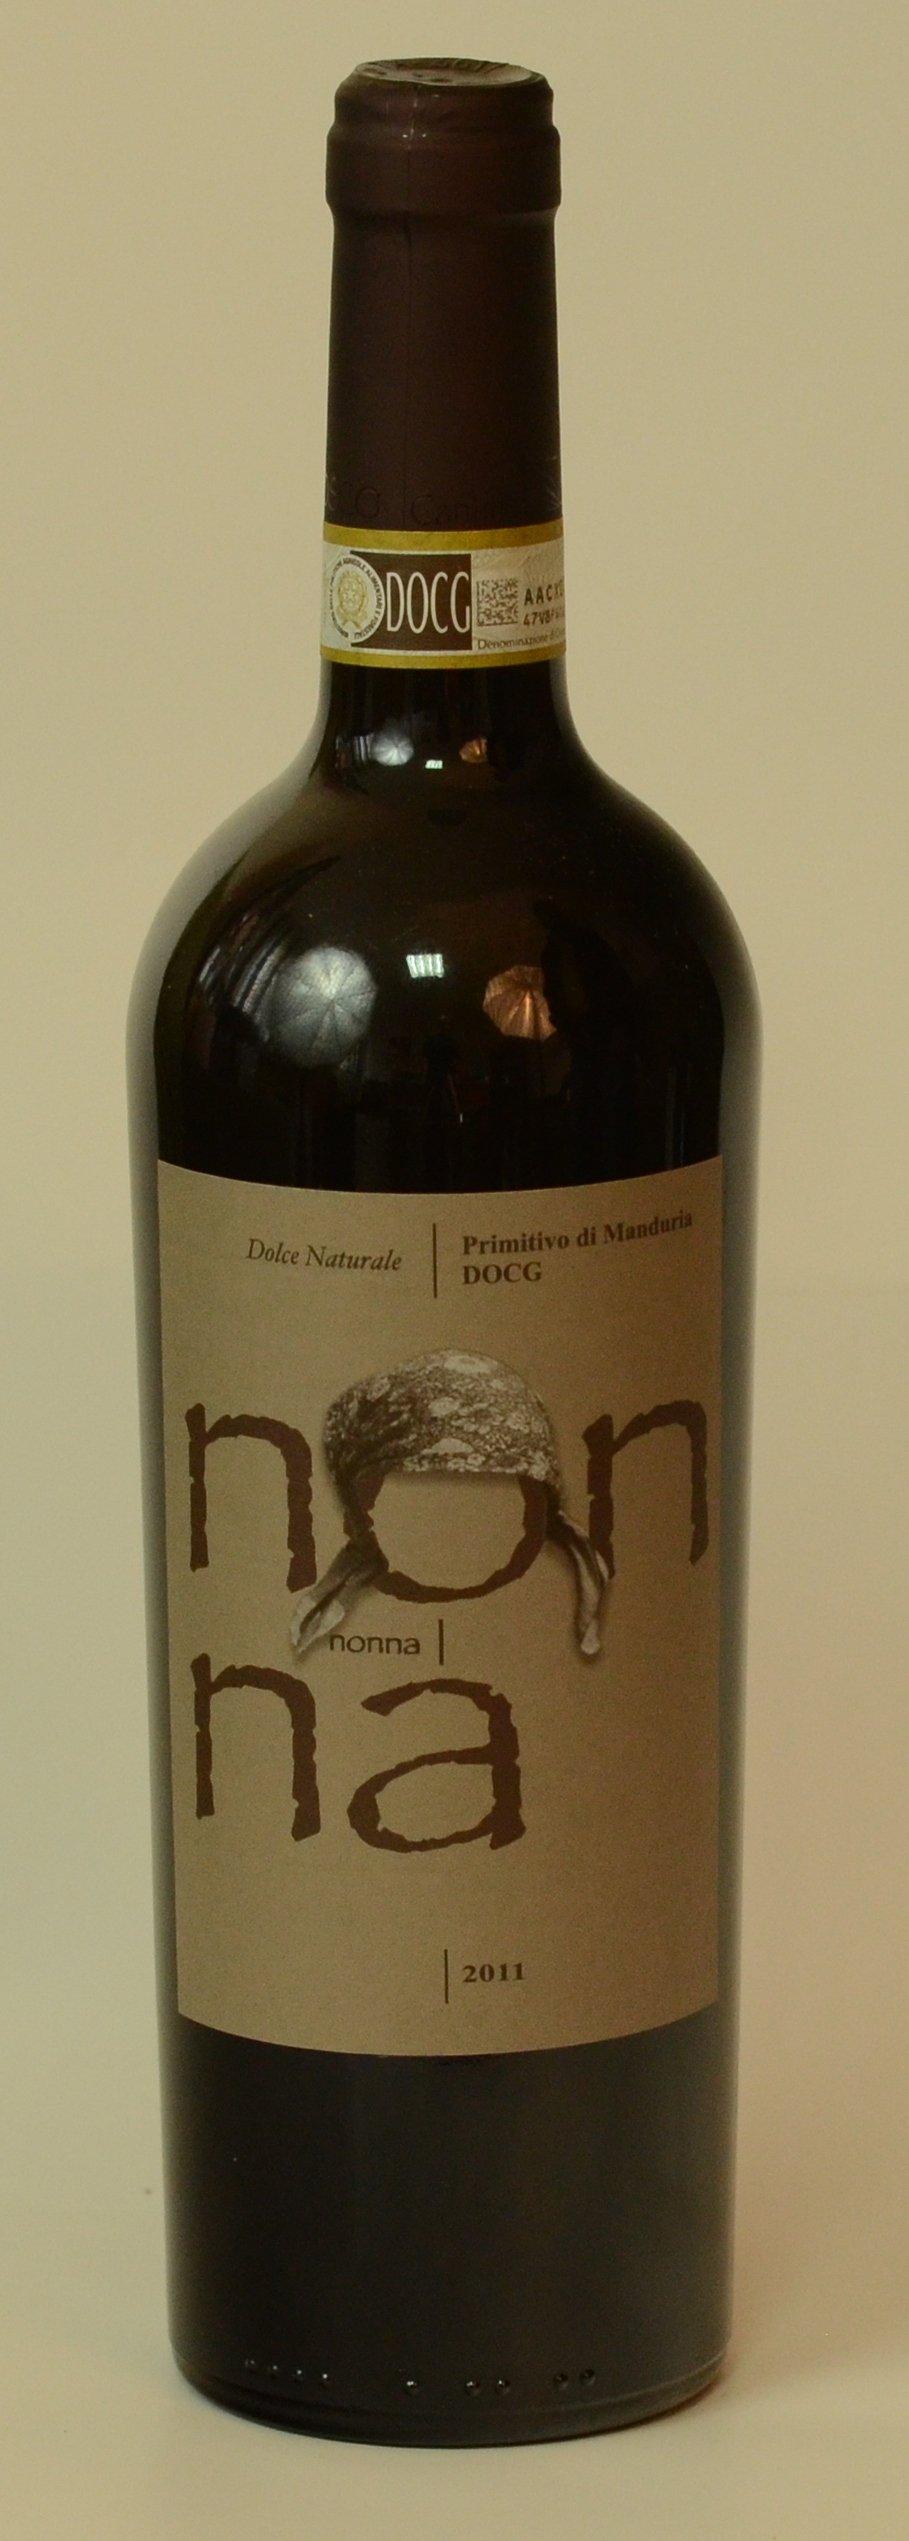 "NONNA  Vin ,,Primitivo di Manduria"" DOC ( Denumire de Origine Controlata ) DULCE NATURAL     16 º Vol"